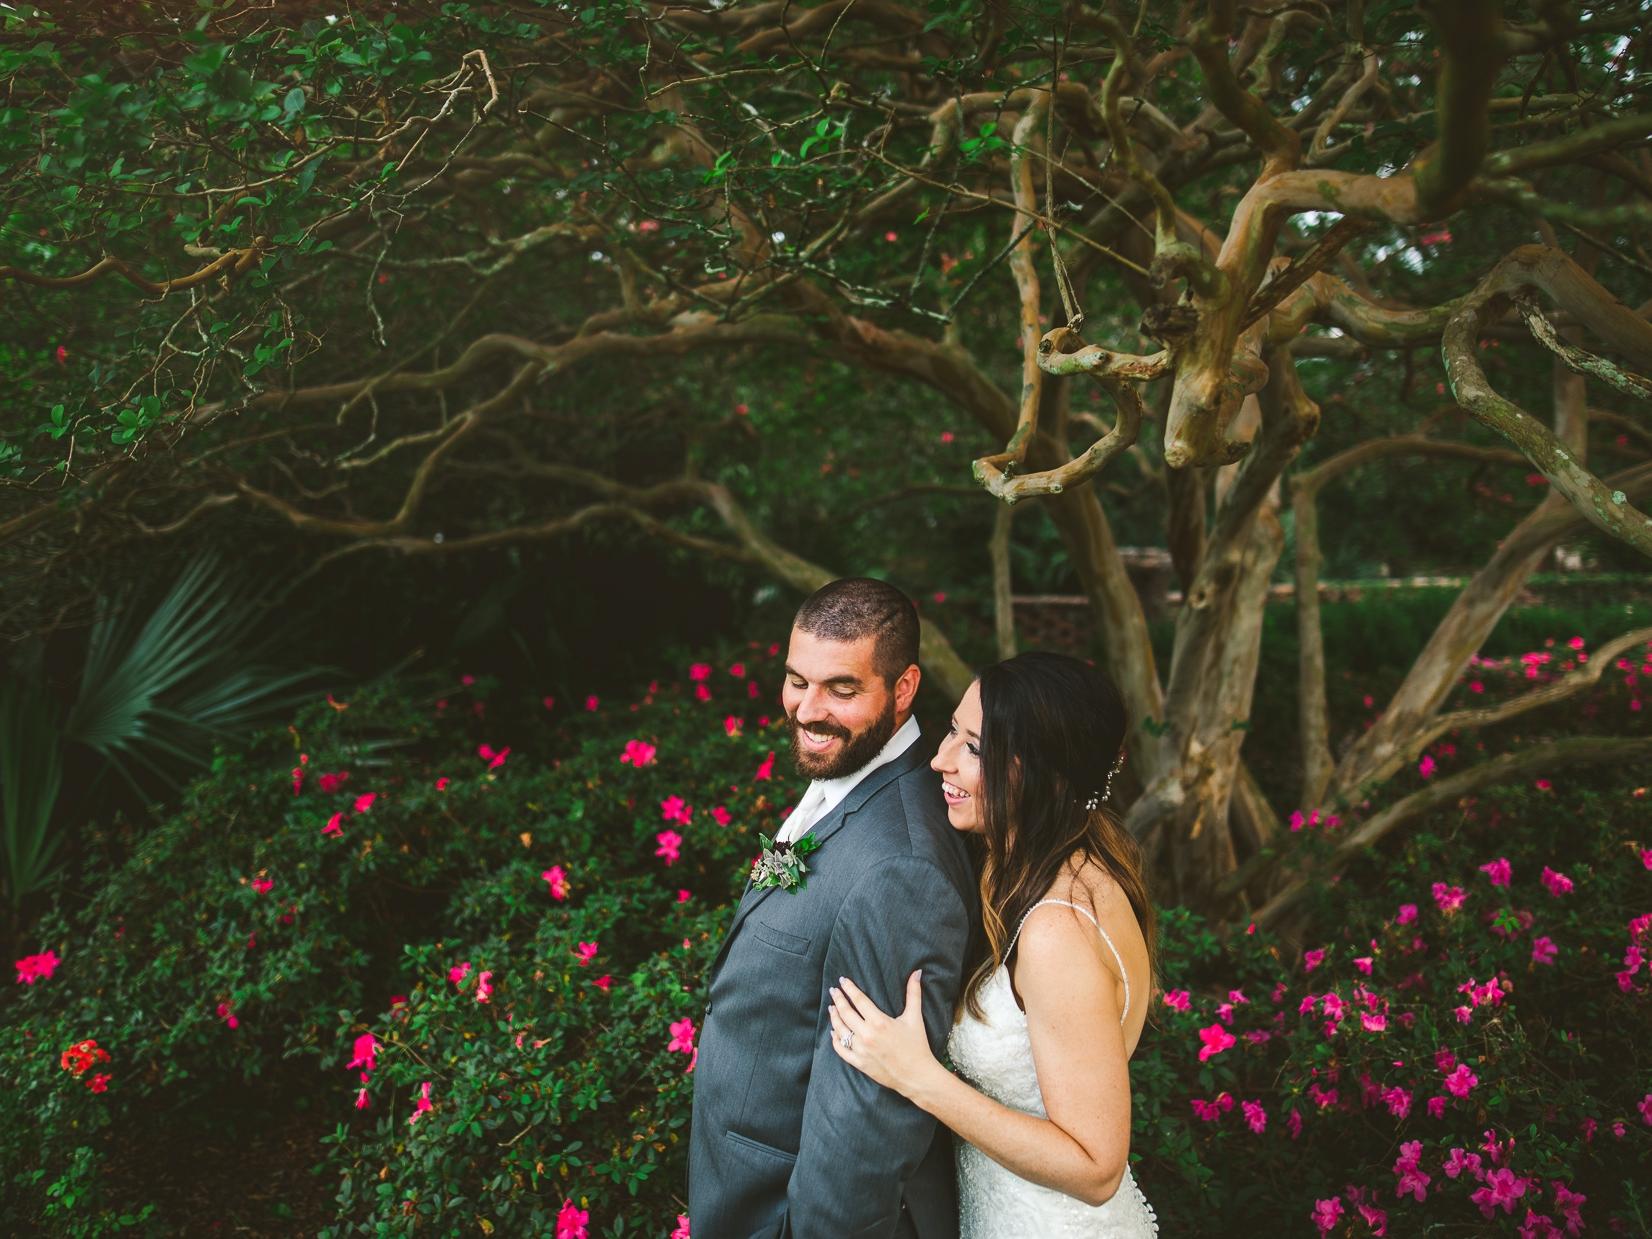 Ali & Lucas // Wedding - Pine Lakes Country Club Myrtle Beach, SC